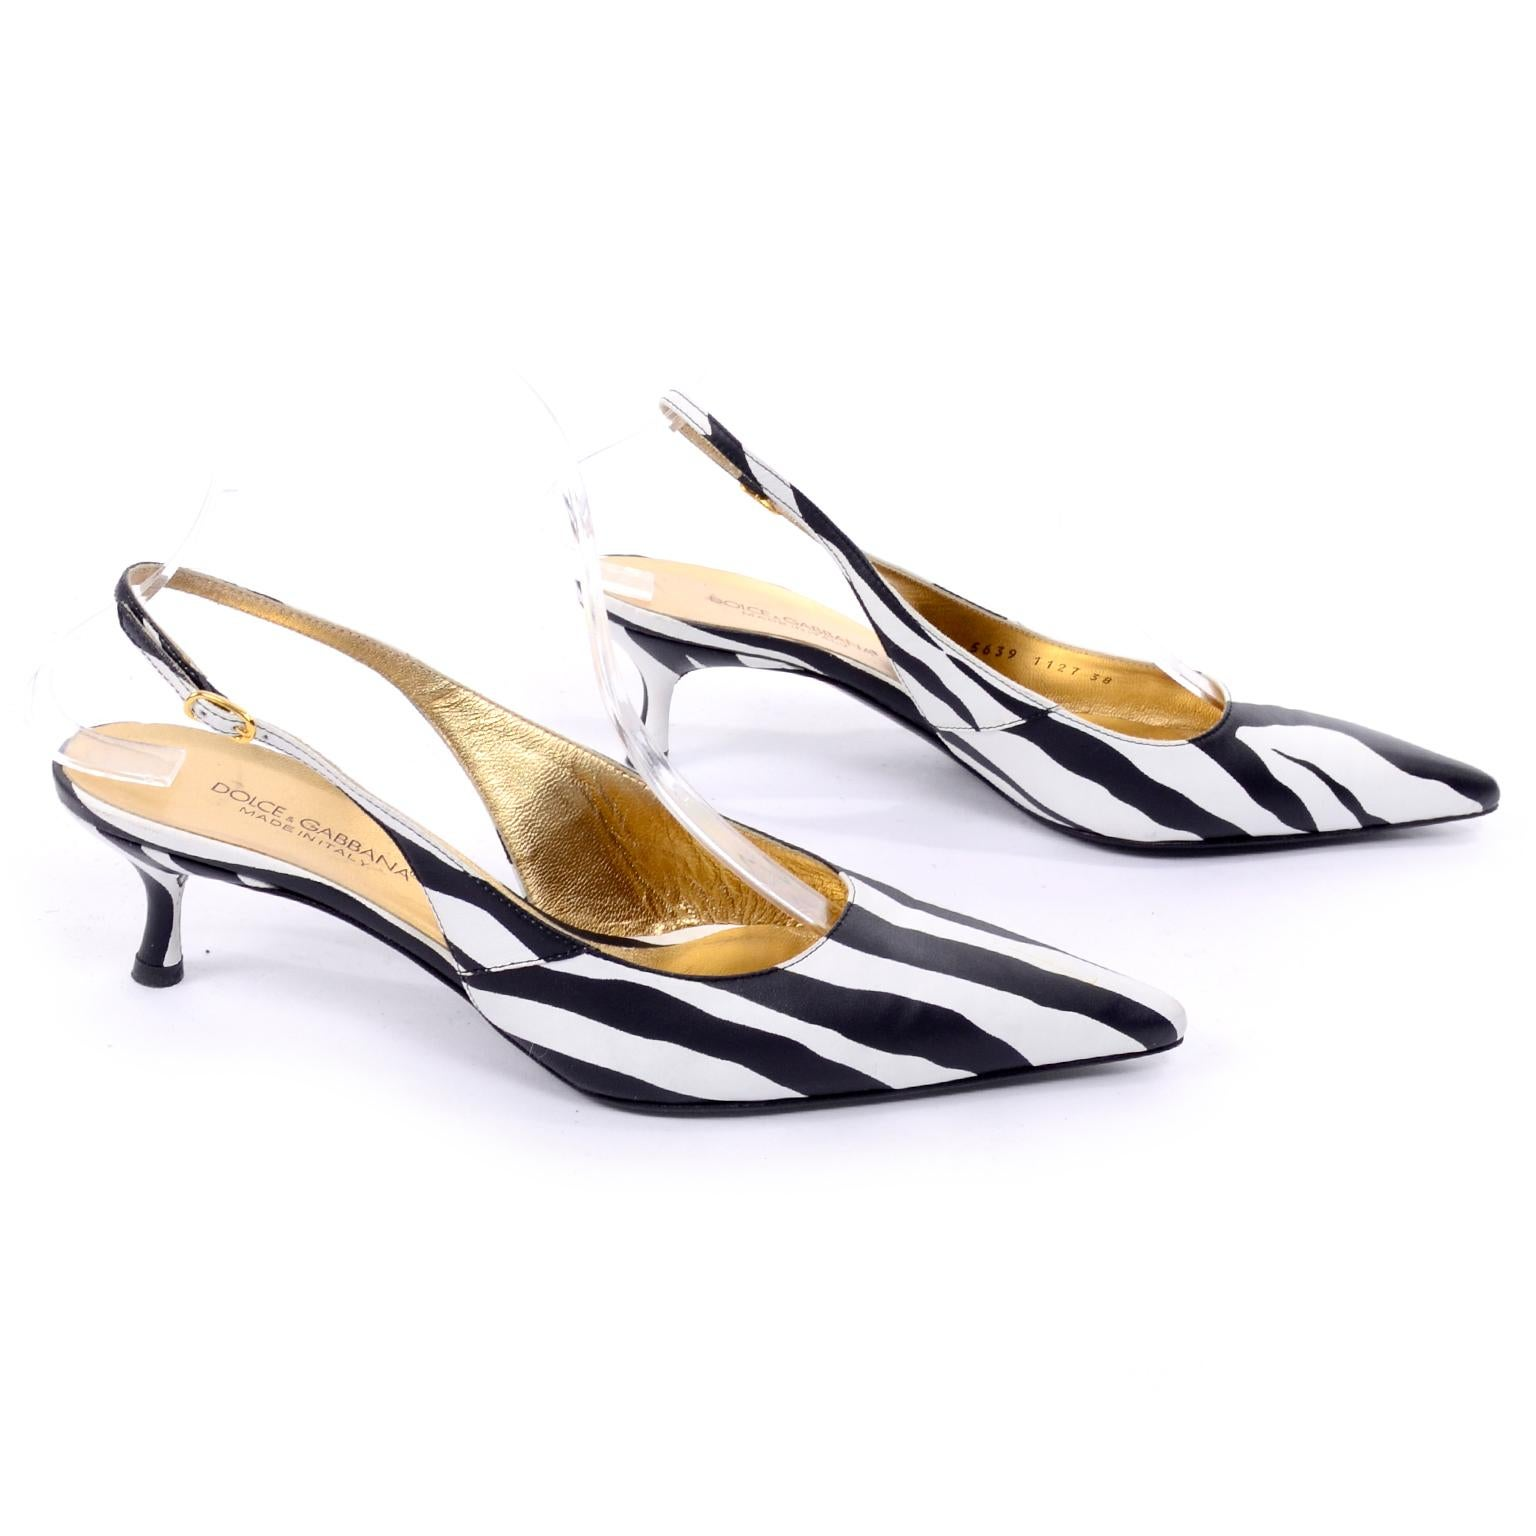 27a092896bc Dolce and Gabbana Zebra Stripe Shoes Vintage Sling Back Kitten Heels in Size  38 For Sale at 1stdibs